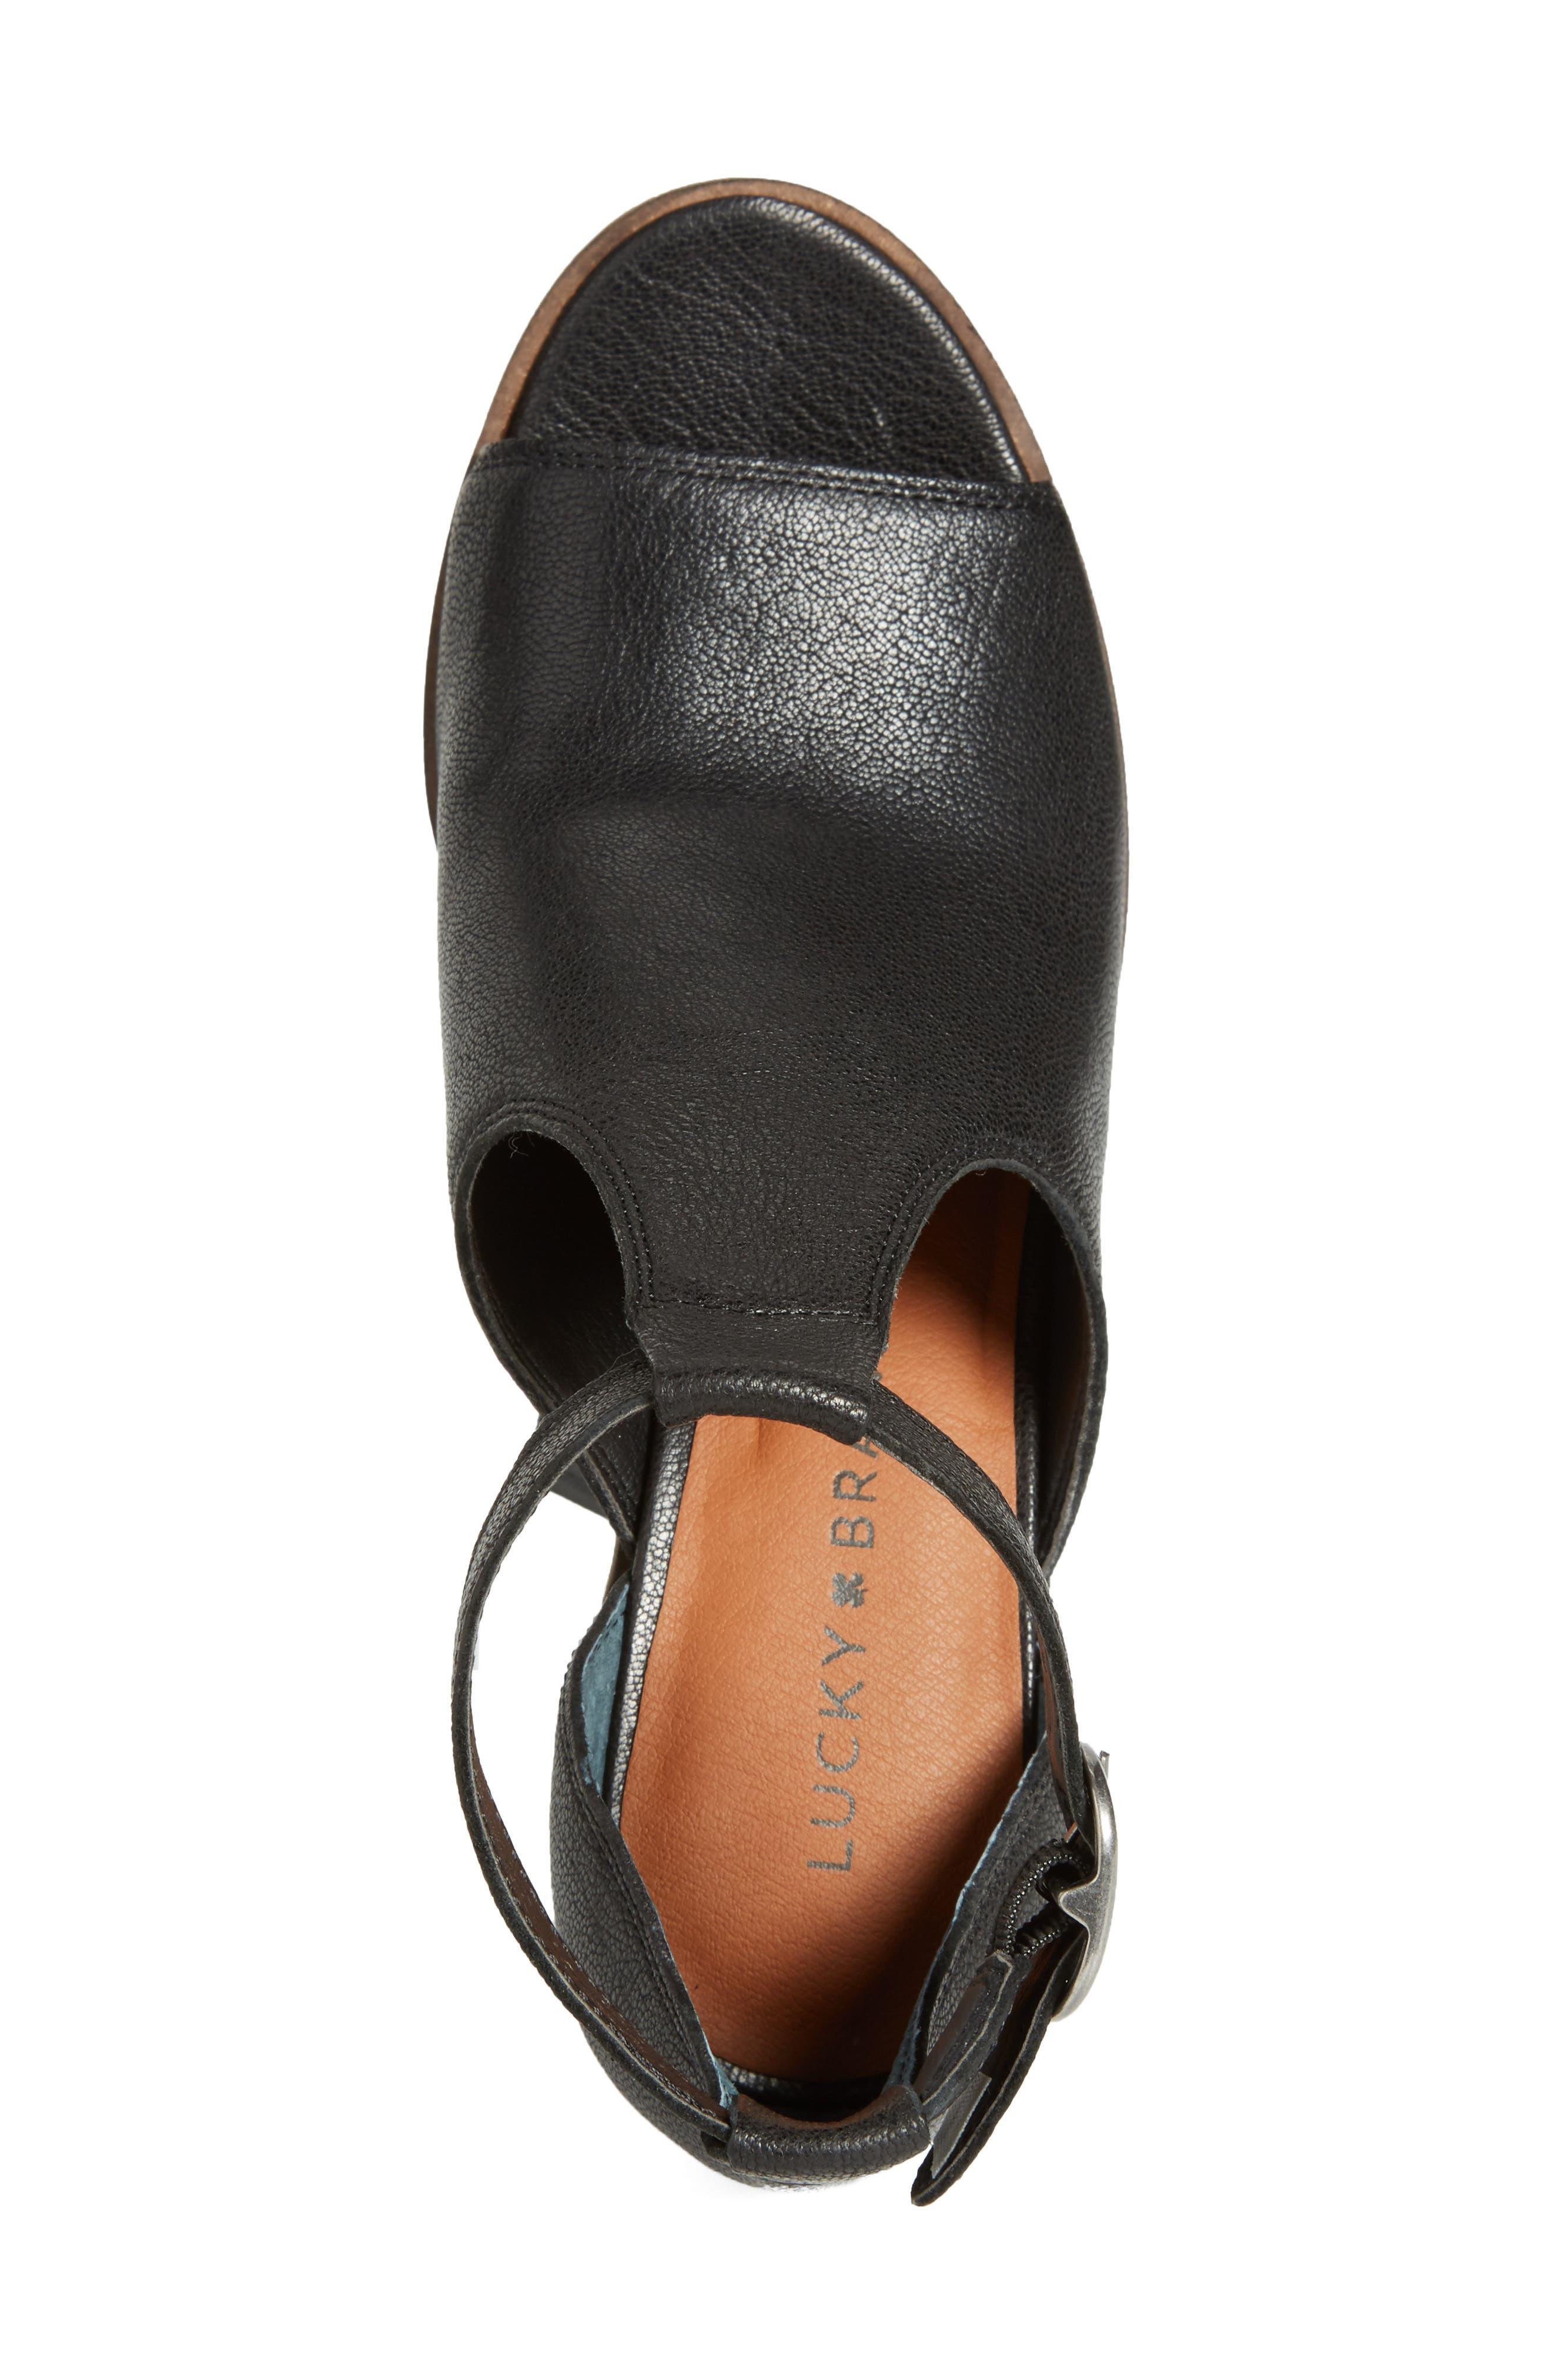 Kadian Block Heel Sandal,                             Alternate thumbnail 9, color,